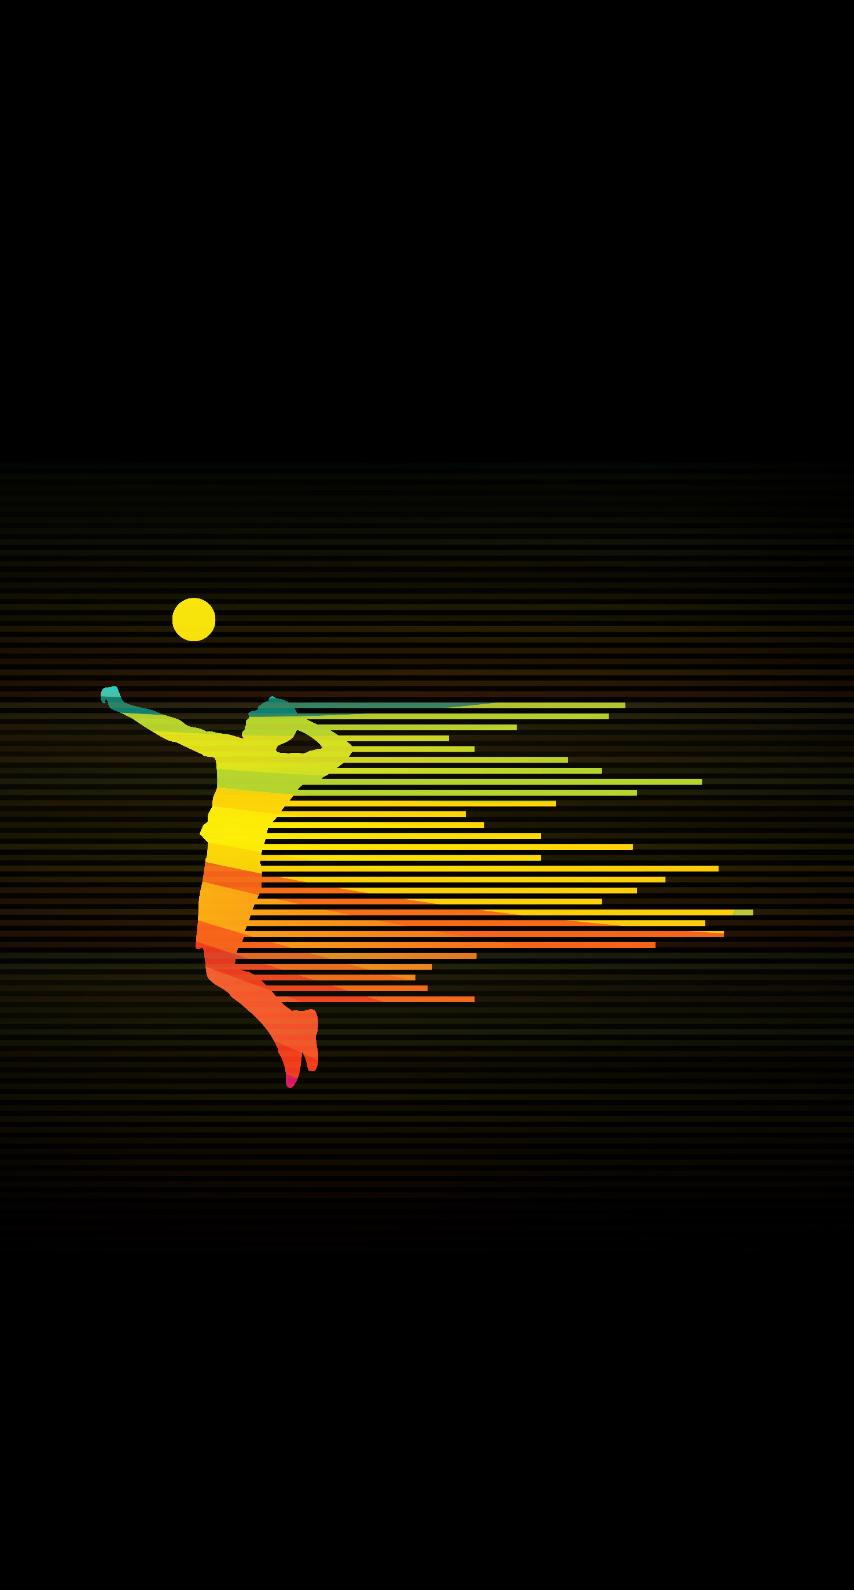 logo, computer wallpaper